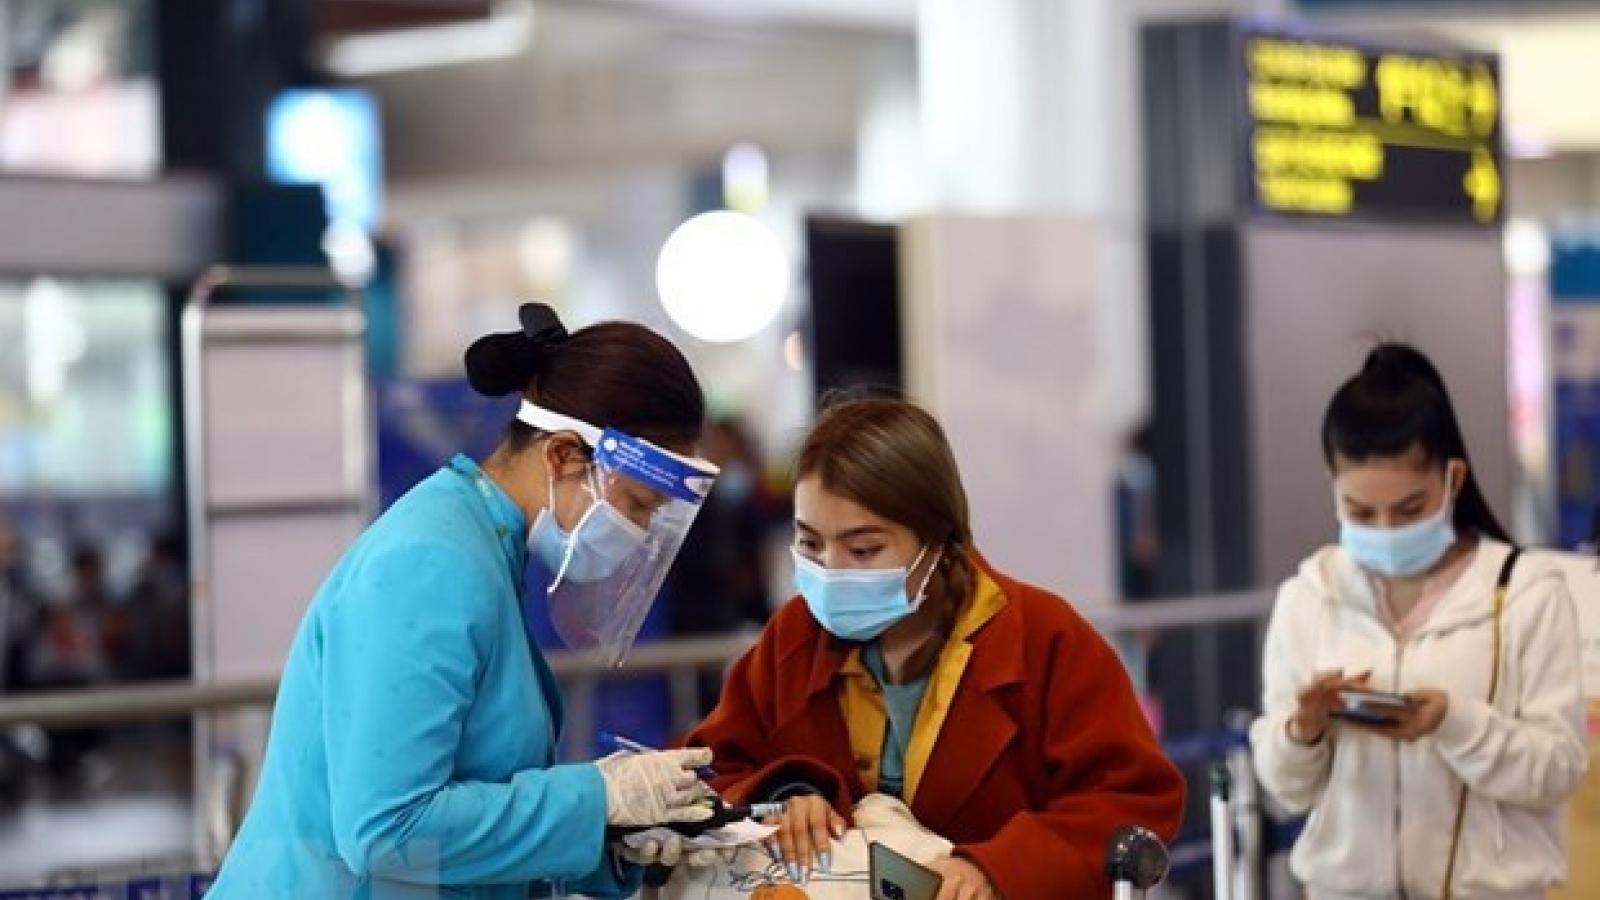 E-health declaration compulsory for all air passengers: CAAV